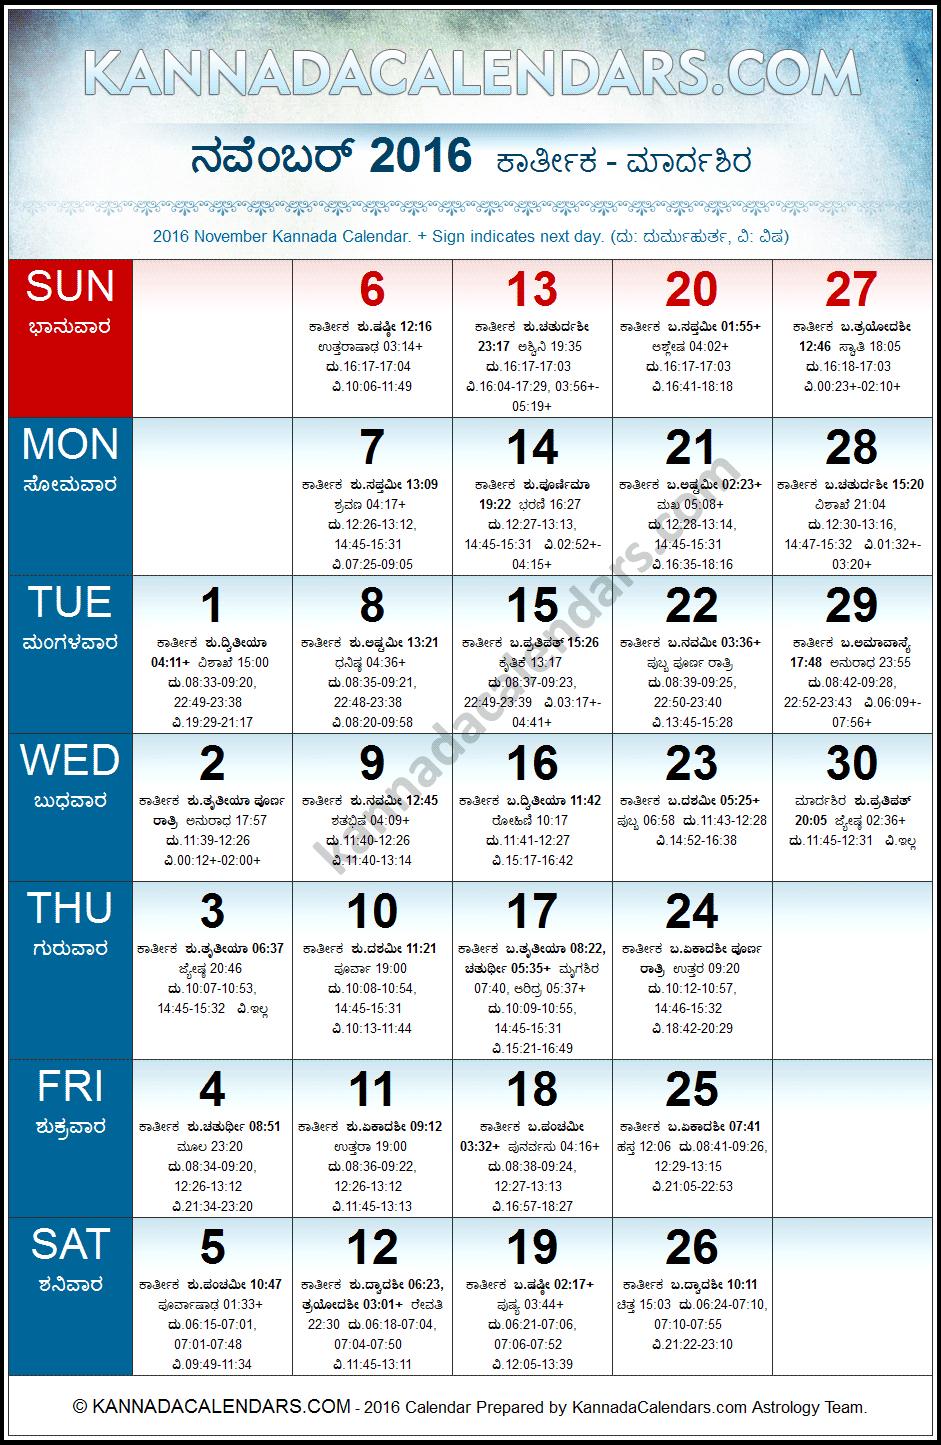 F2963D November 2016 Kannada Calendar C Durmukhi Nama intended for Kannada Calendar 2020 July